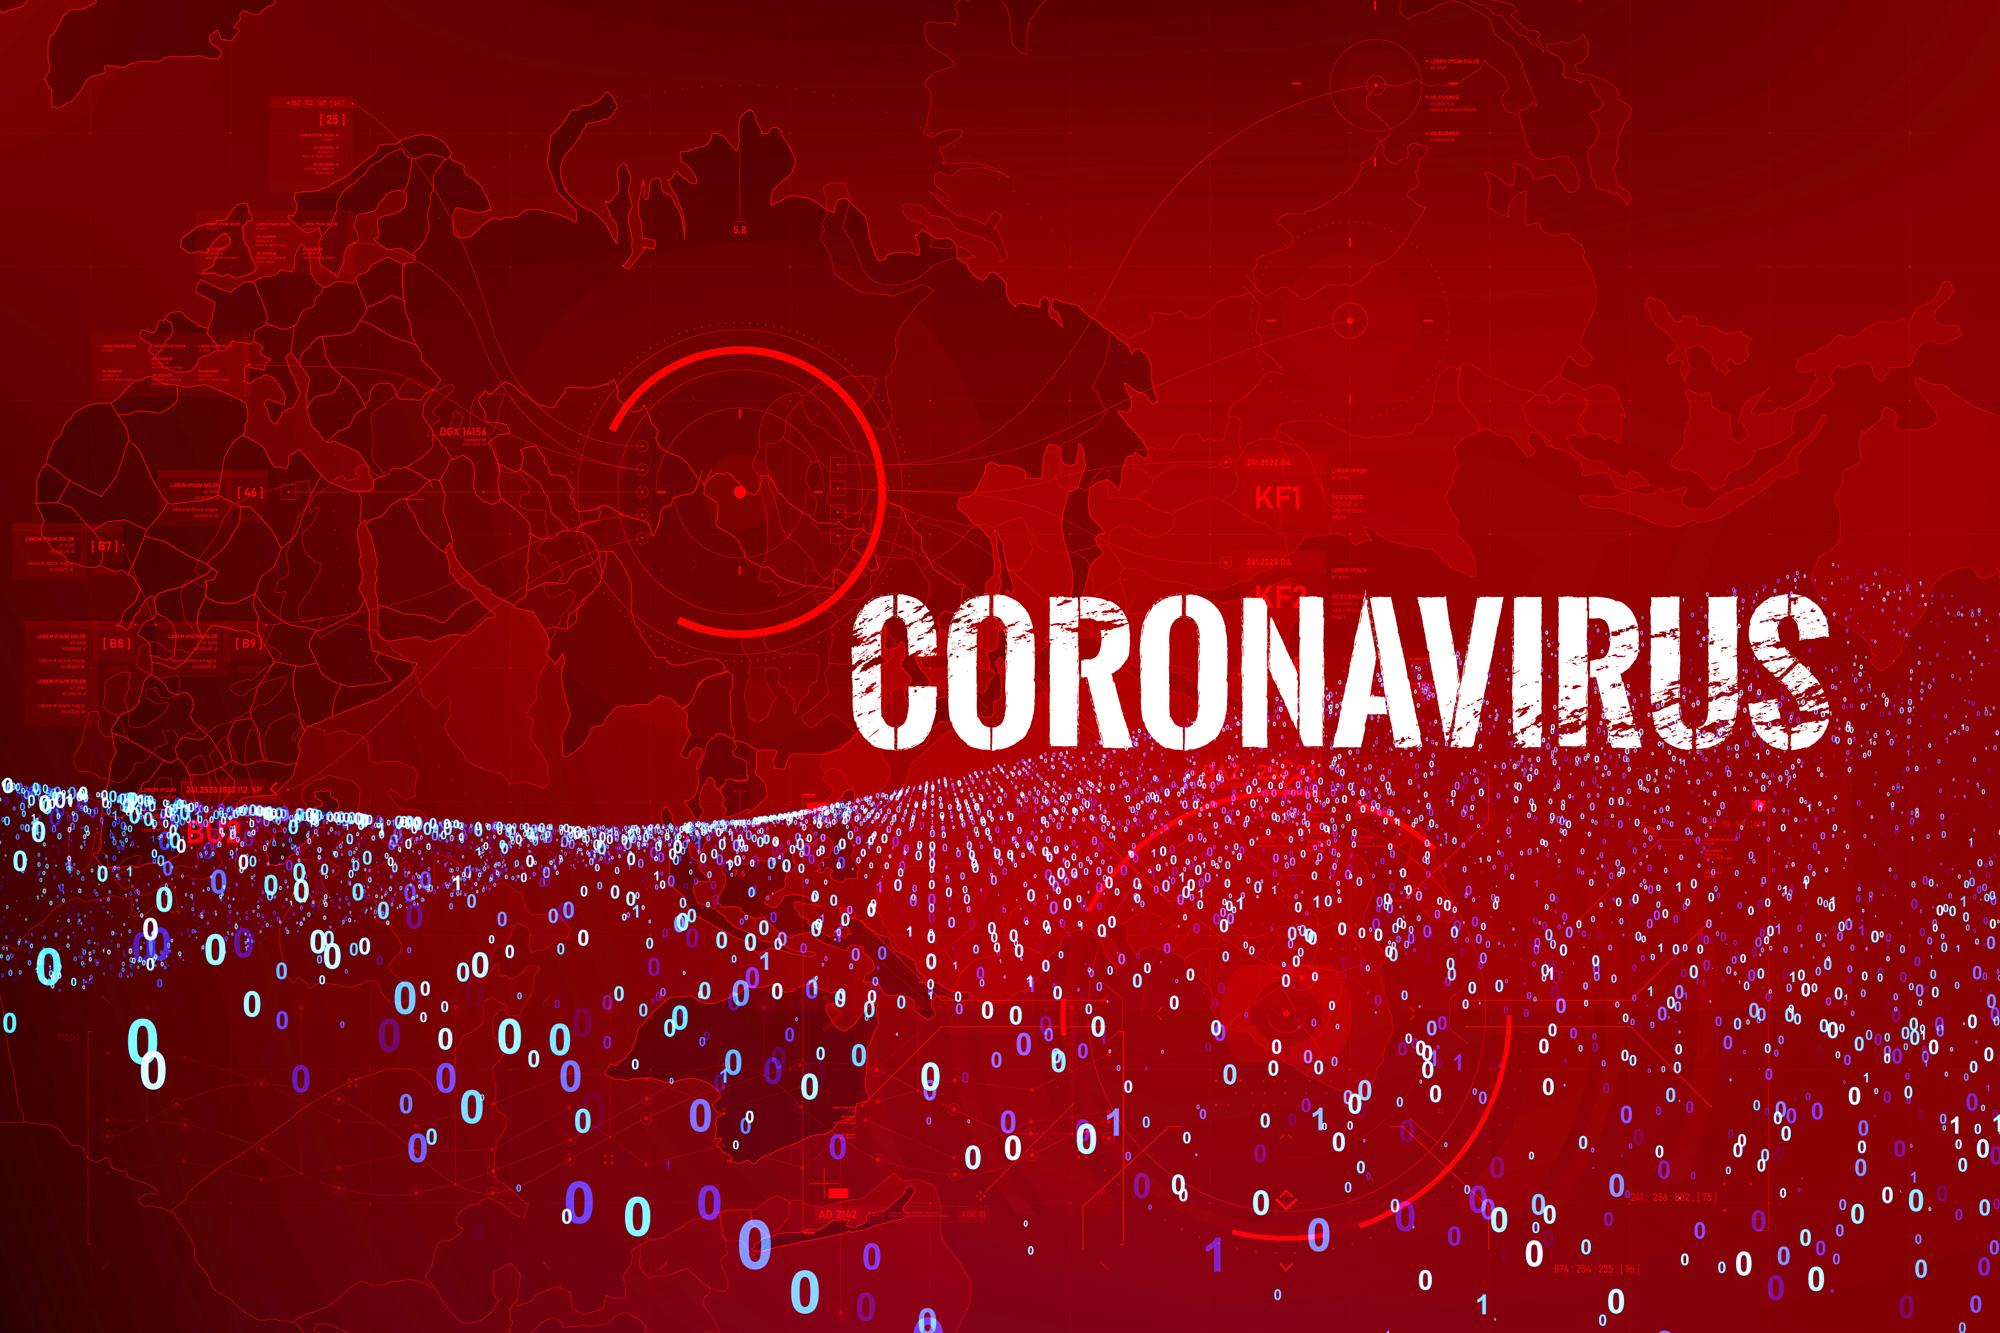 koronavirus-illusztracio.jpg